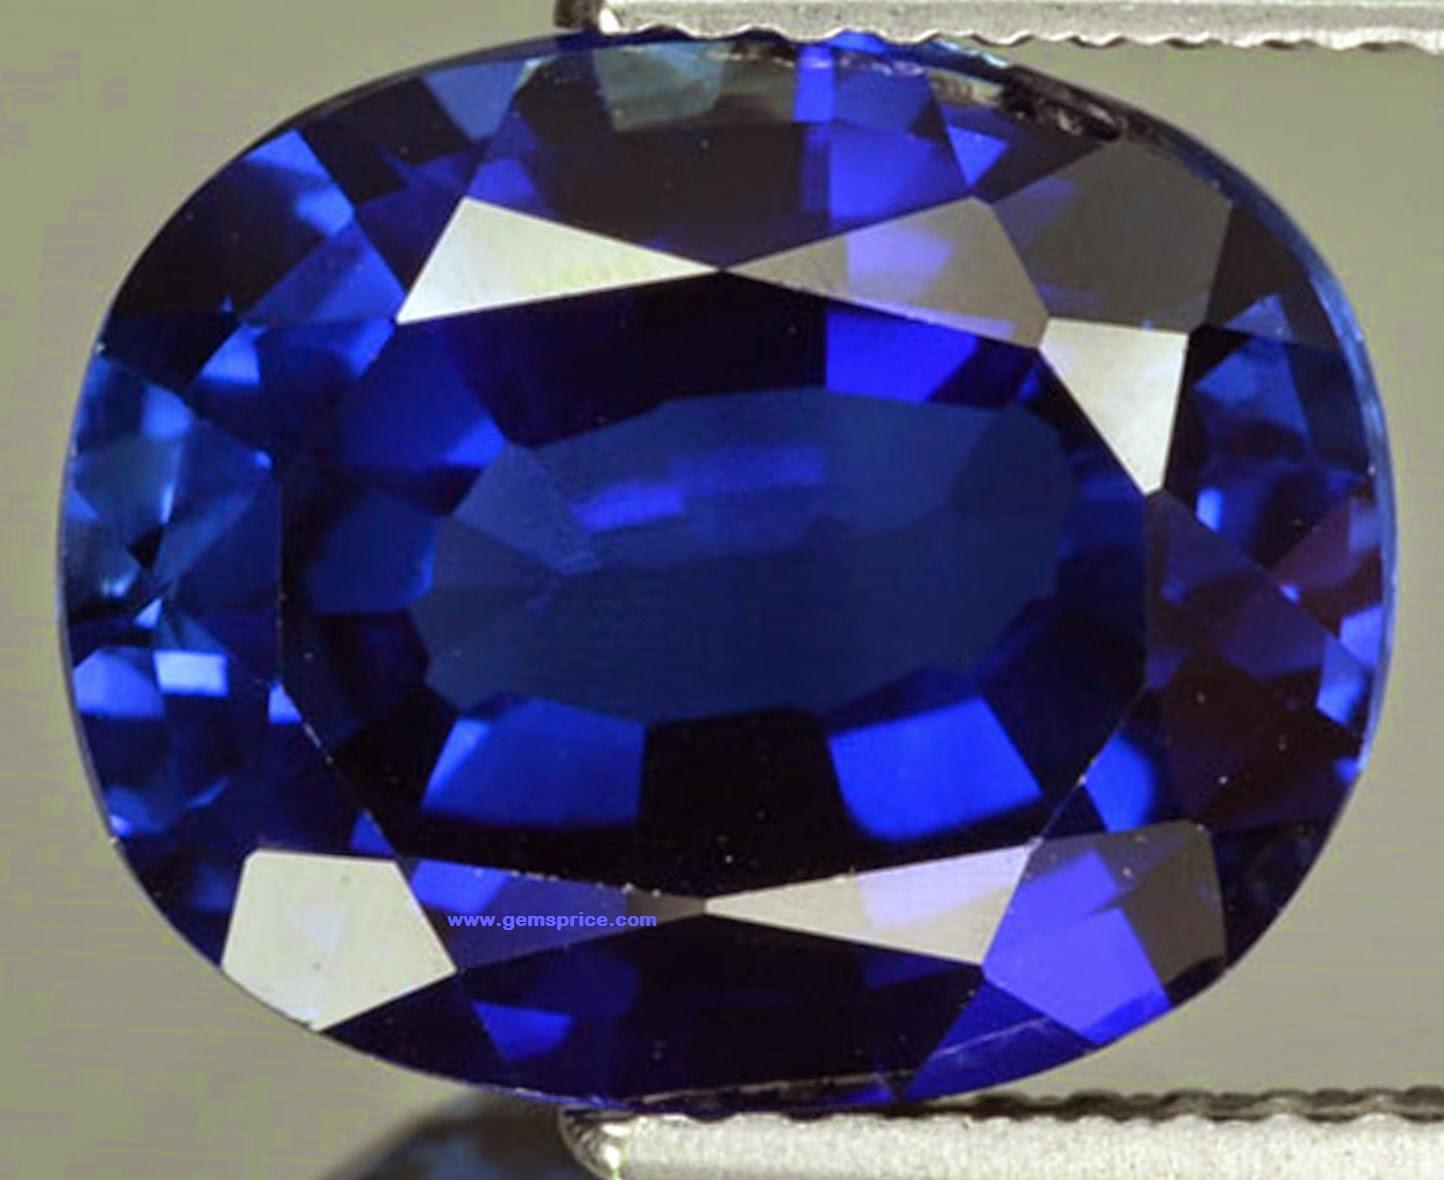 http://1.bp.blogspot.com/-844UdrtqCBk/U9xjRuHOZpI/AAAAAAAADR4/1AgbXE2qSvY/s1600/S522P.jpg